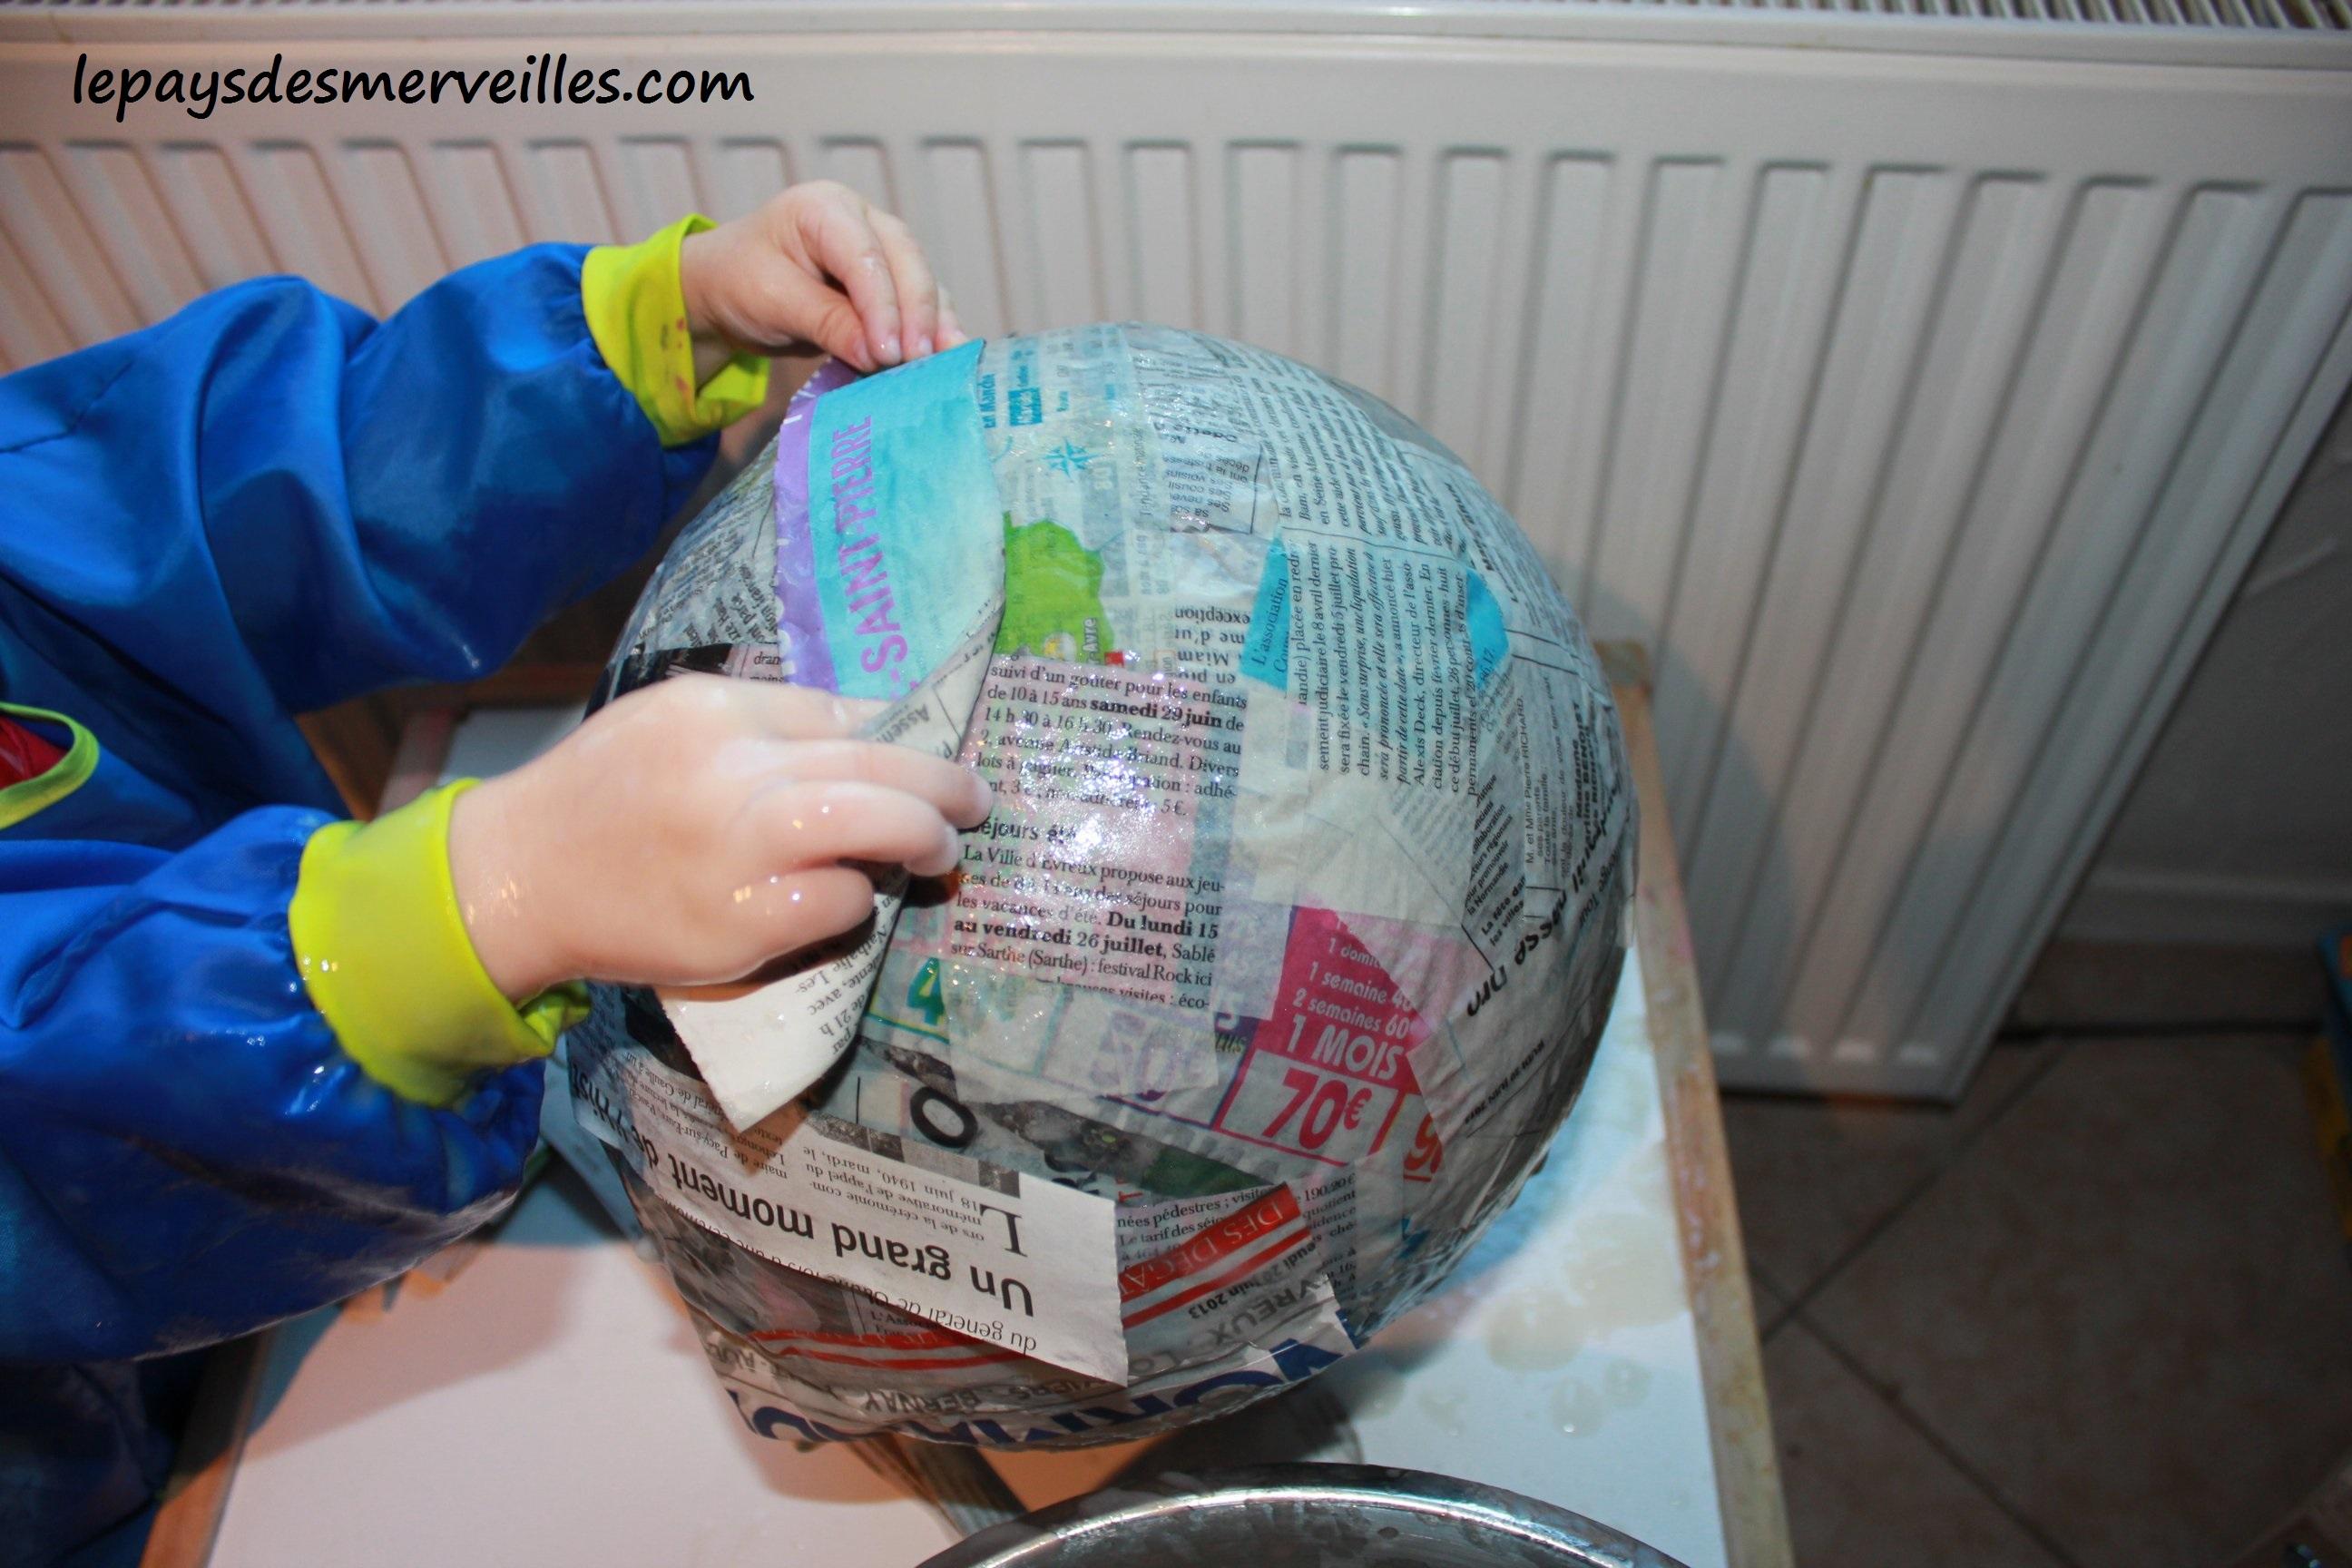 Bricolage halloween citrouille en papier mach colle - Bricolage en papier journal ...